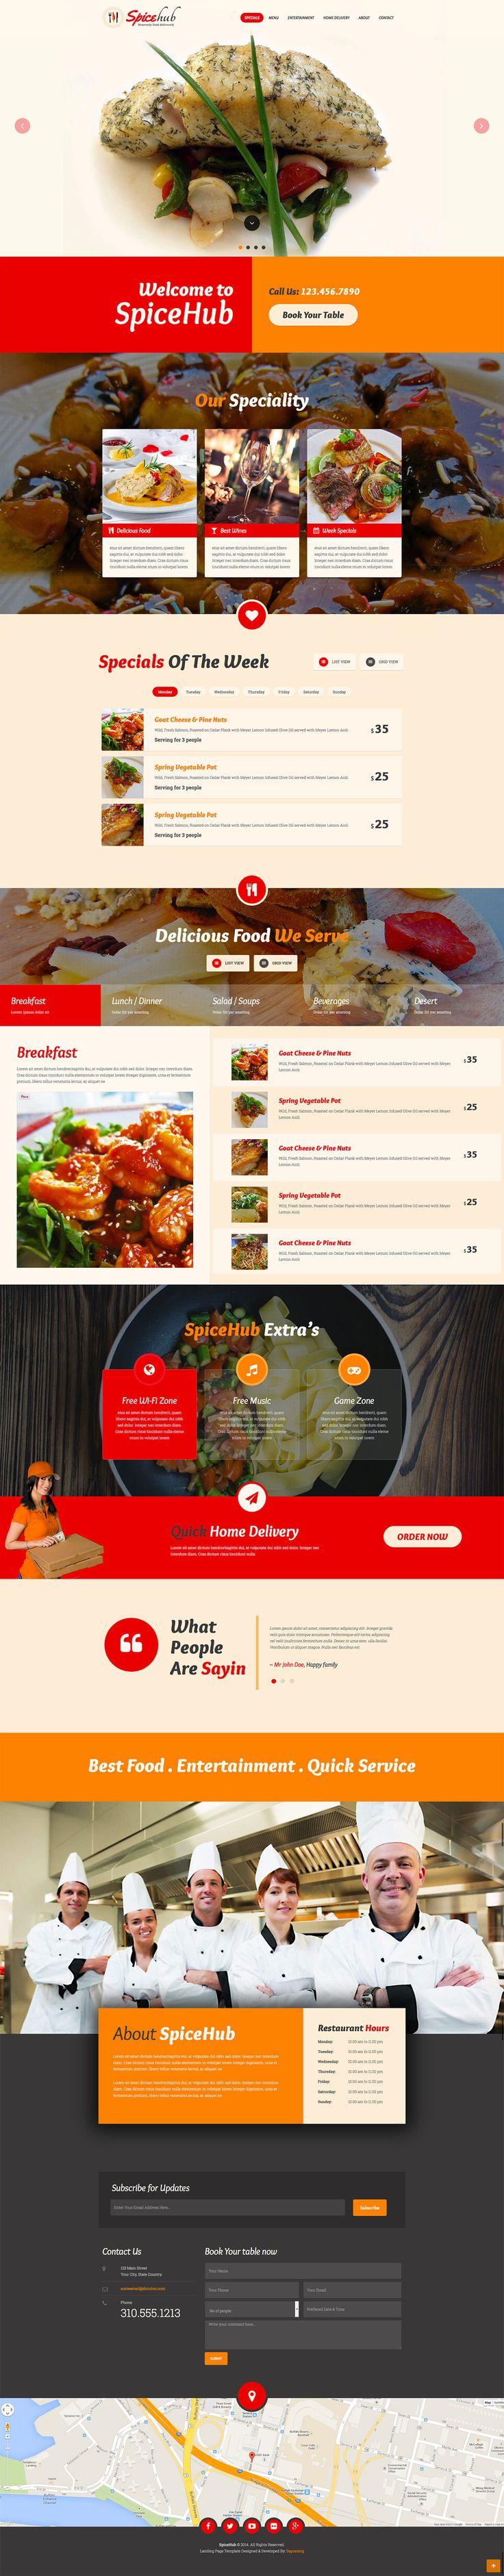 SpiceHub Restaurant Responsive Landing Page by Saptarang #webdesign